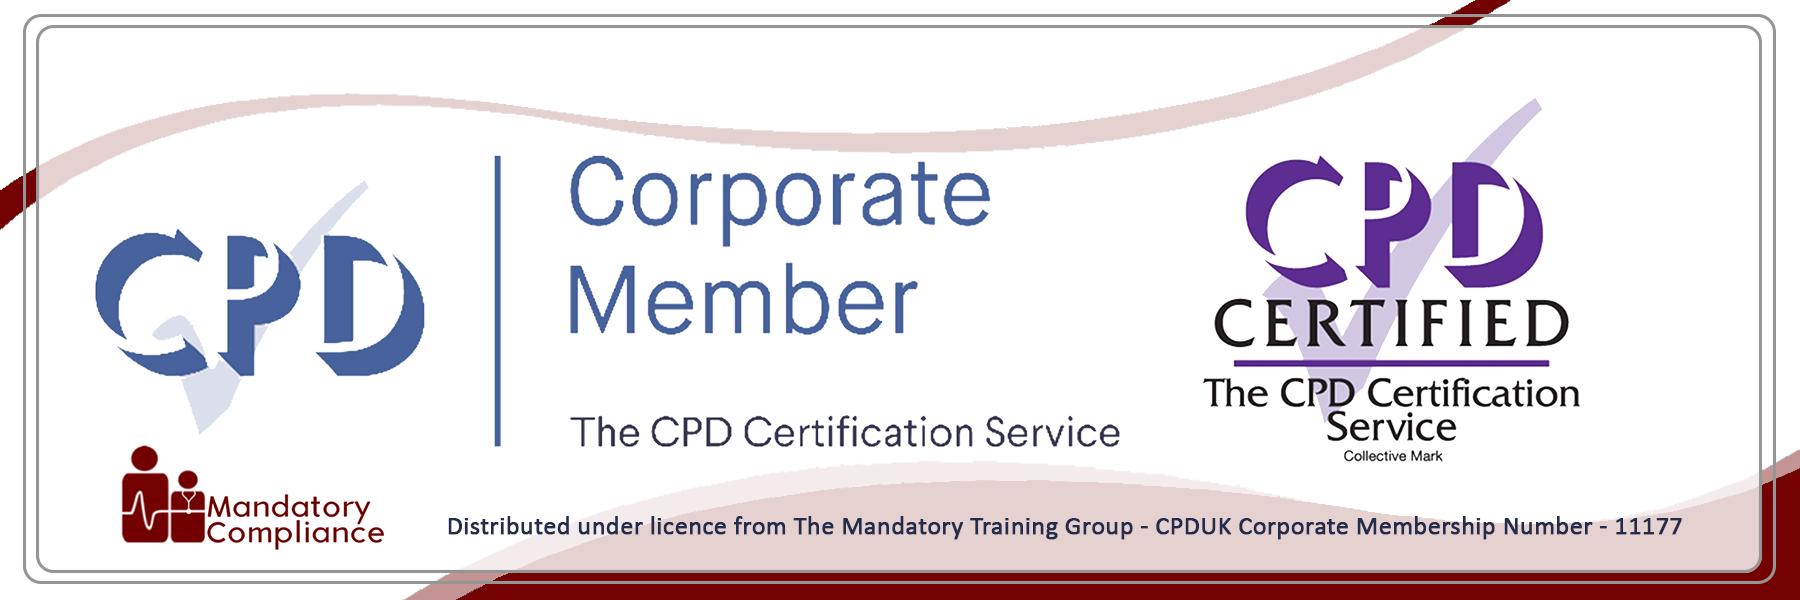 Crisis Management - Online Training Course - CPDUK Accredited - Mandatory Compliance UK -